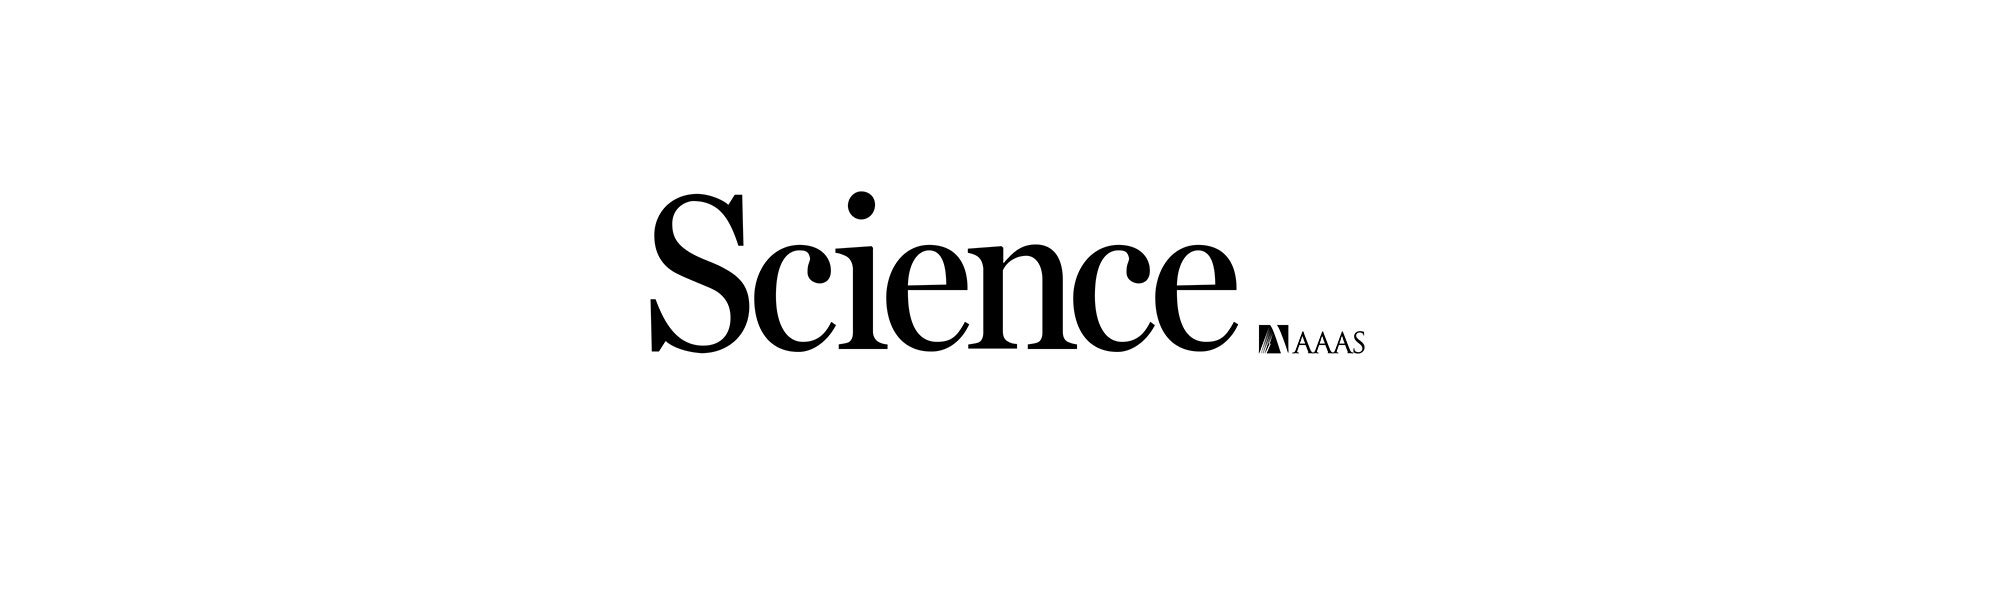 Science Translational Medicine No. 470 …more